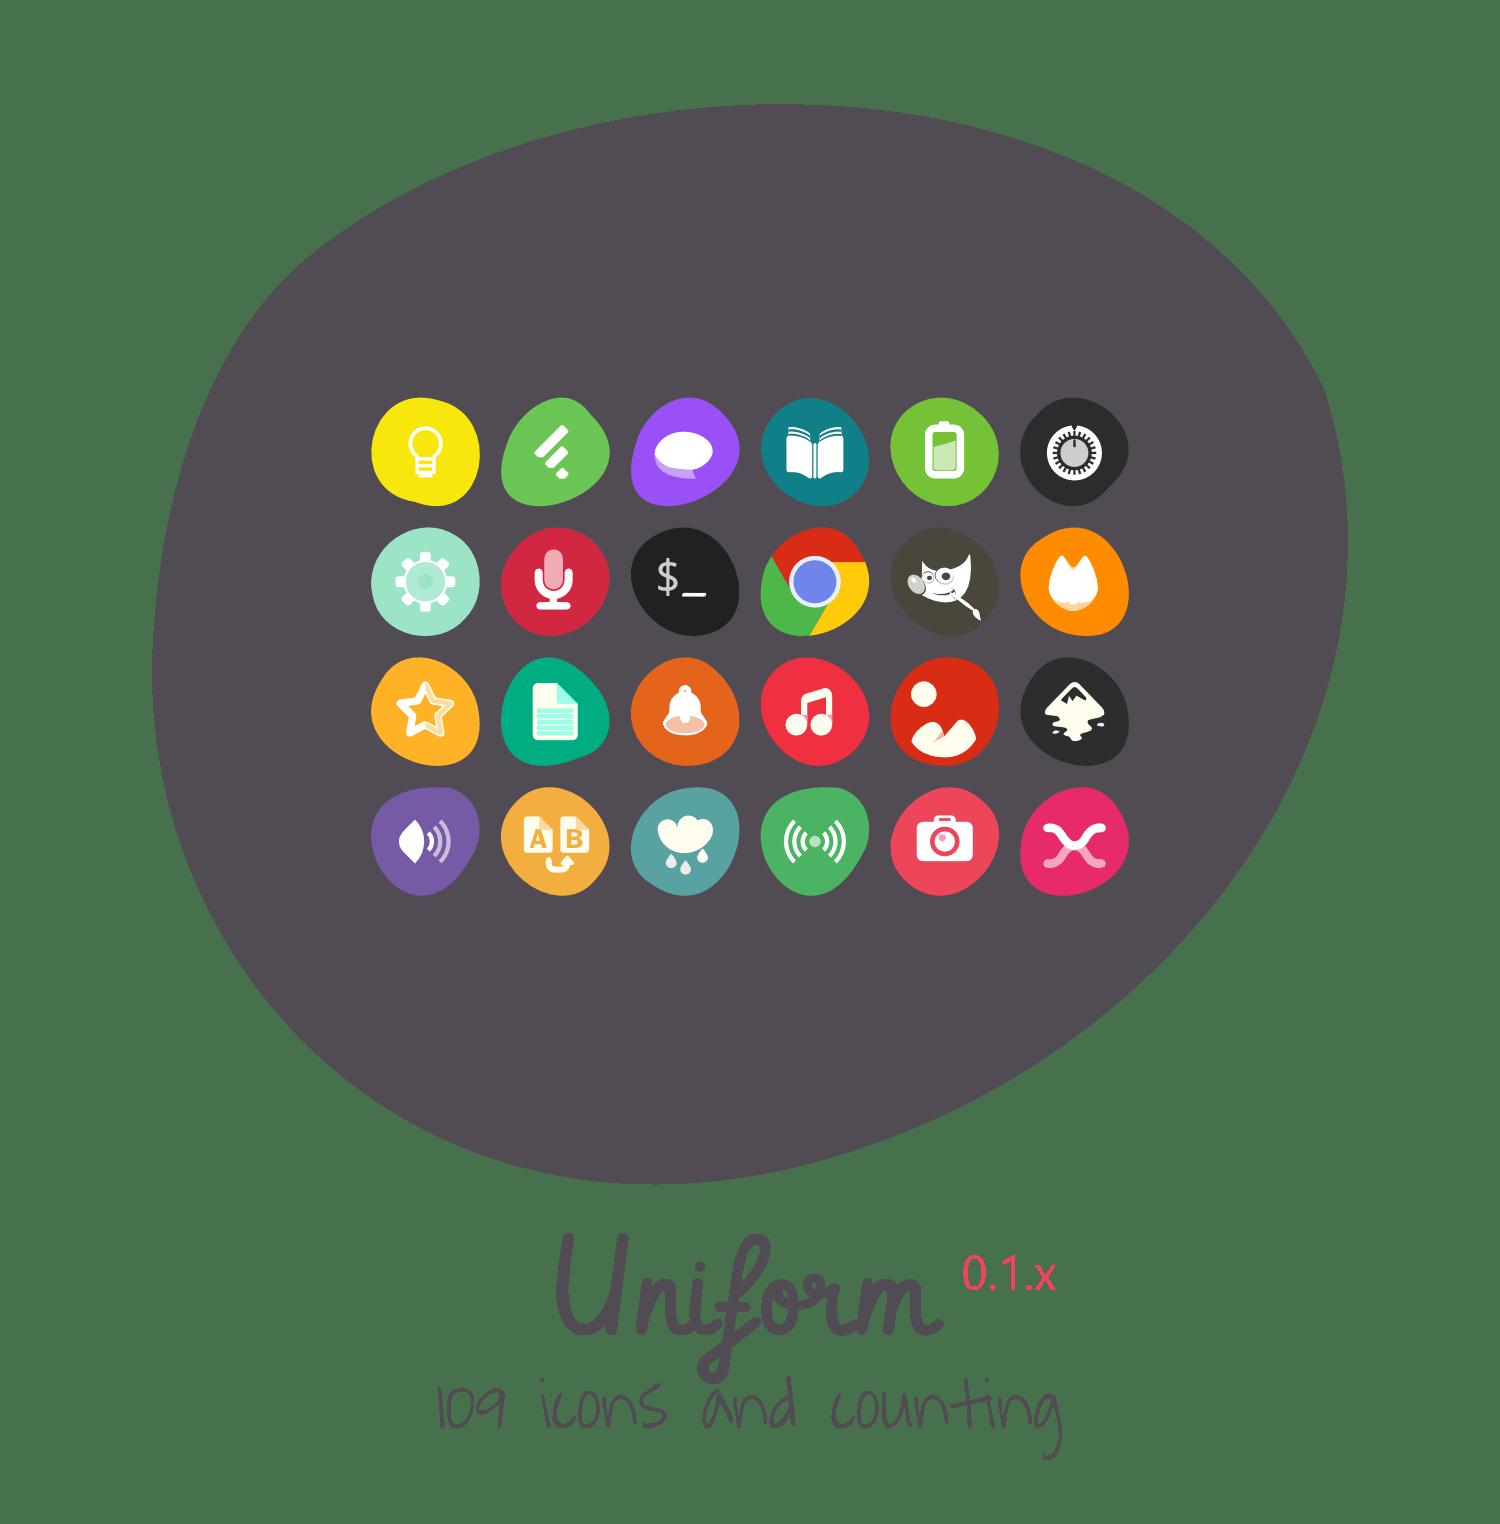 3d Art Mobile Wallpaper Uniform Icon Theme By 0rax0 On Deviantart